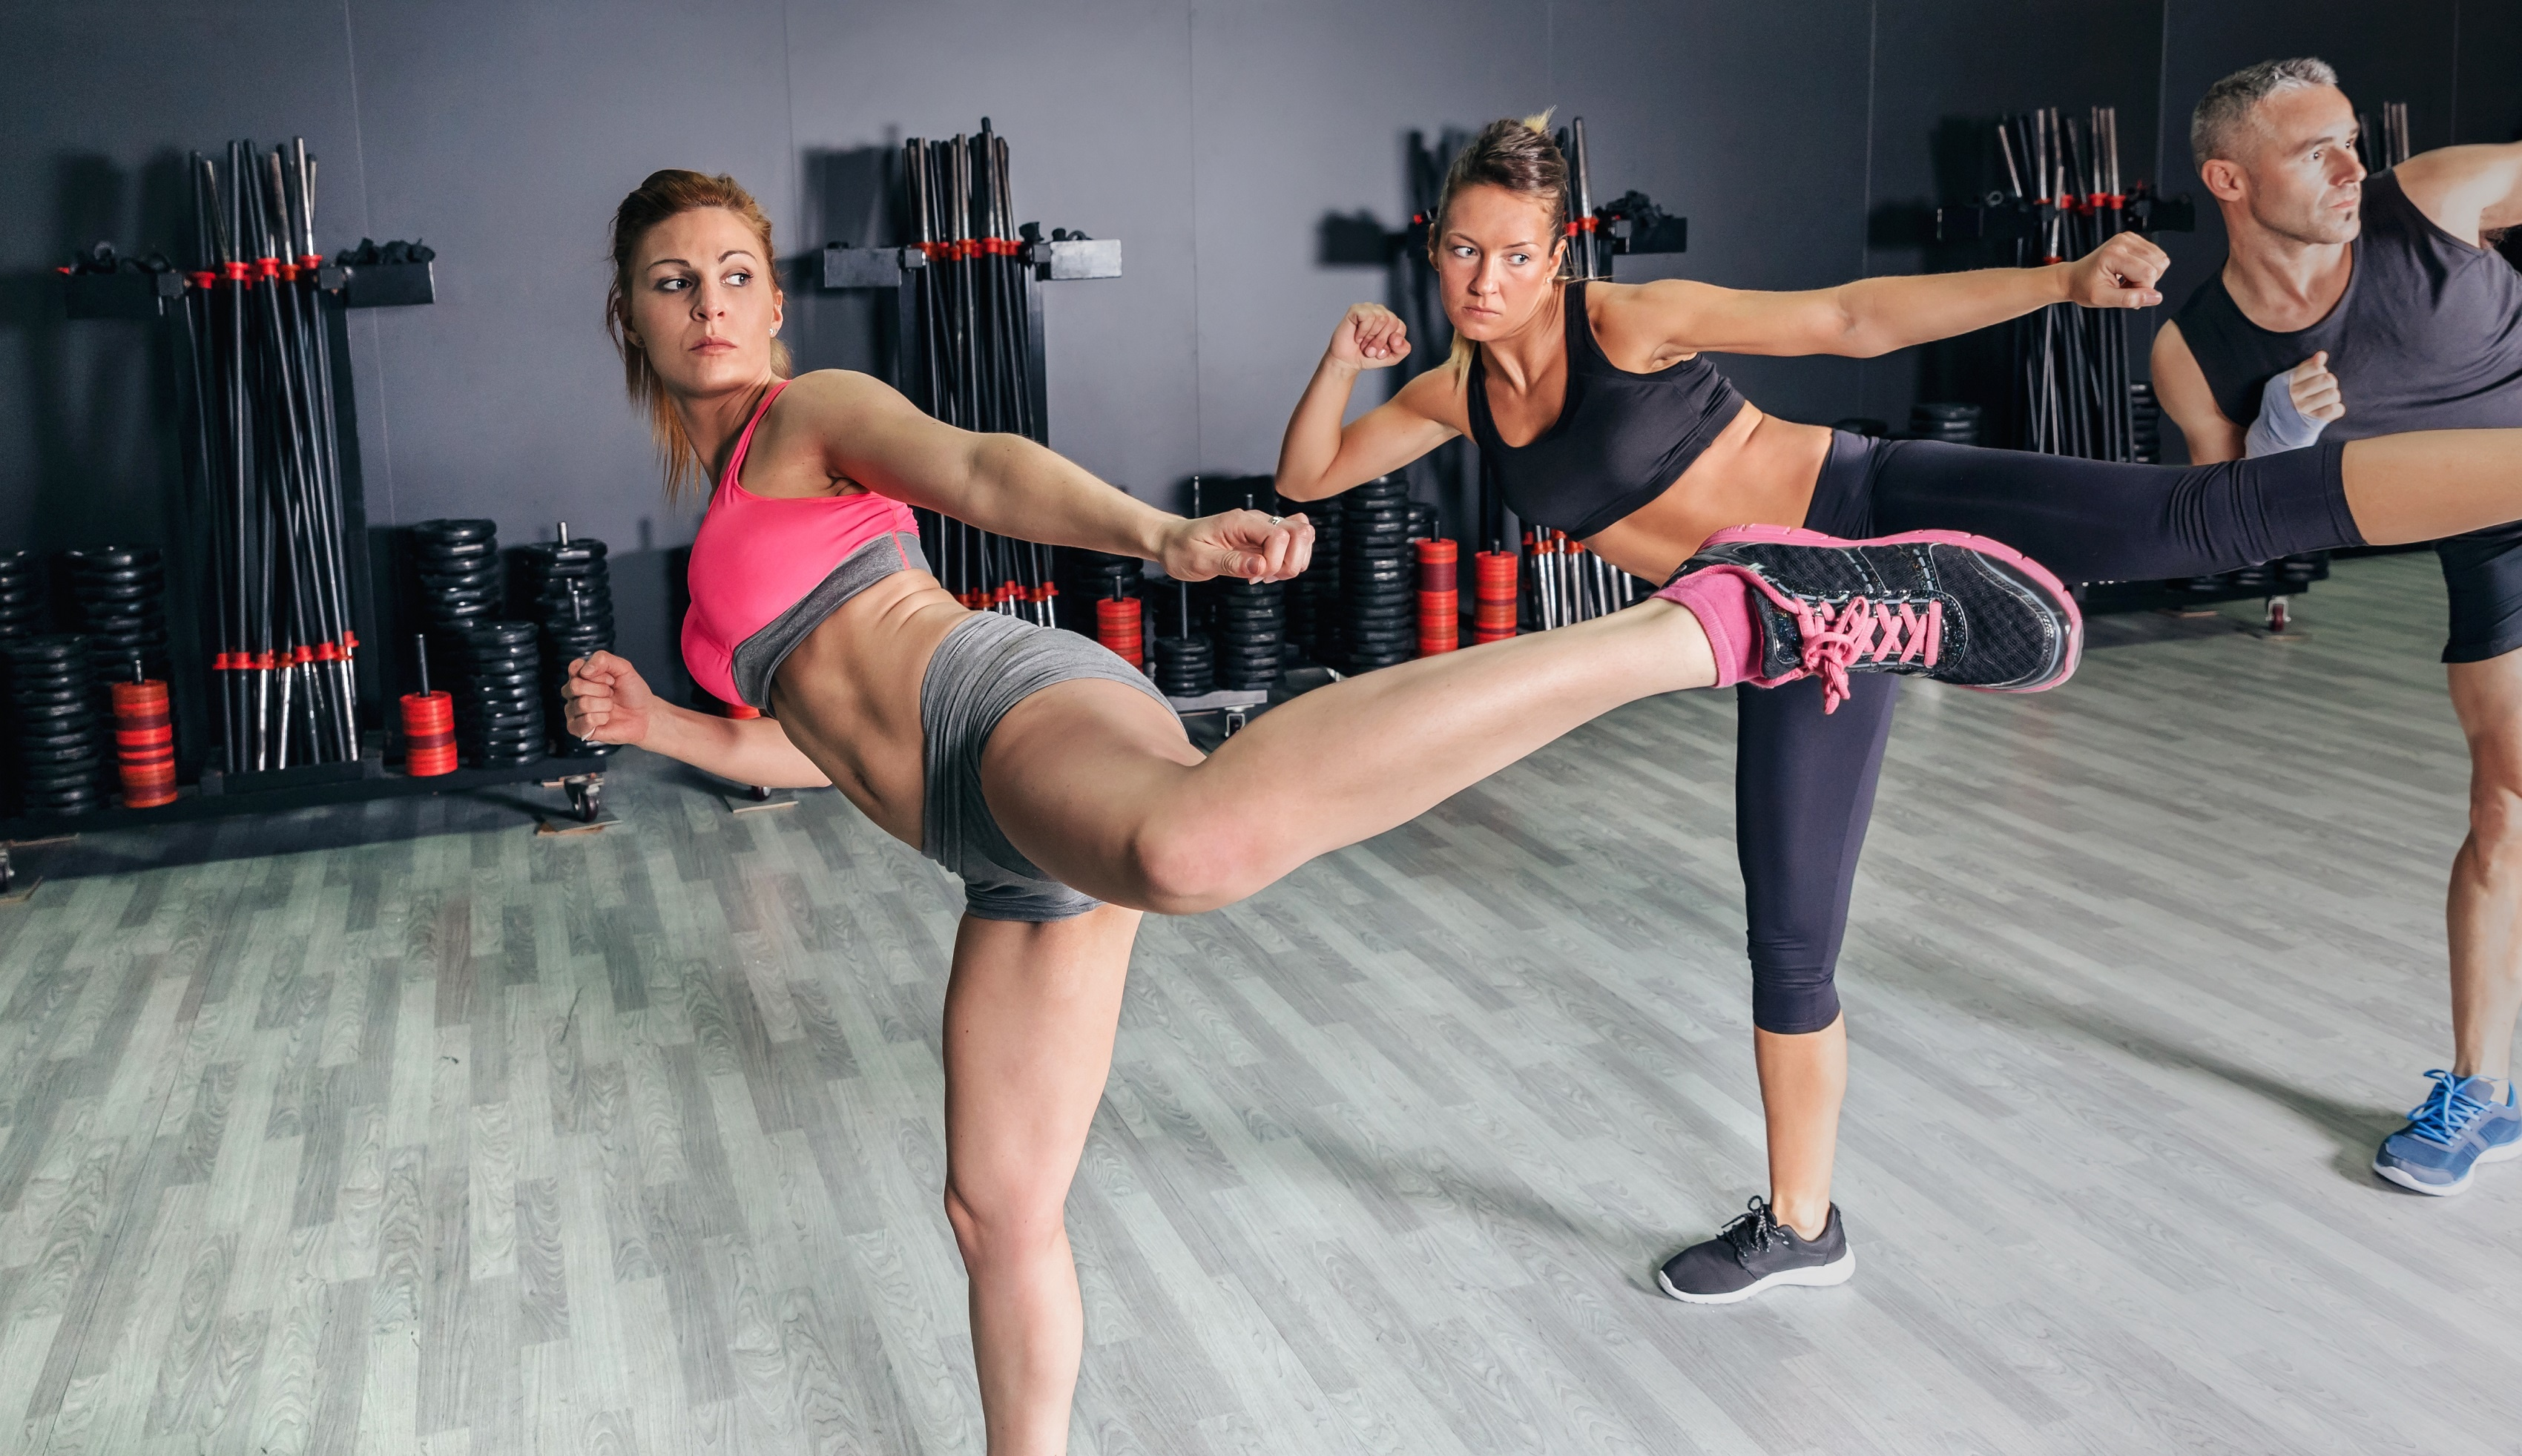 Cardio kickboxing is fun and amazing exercise!